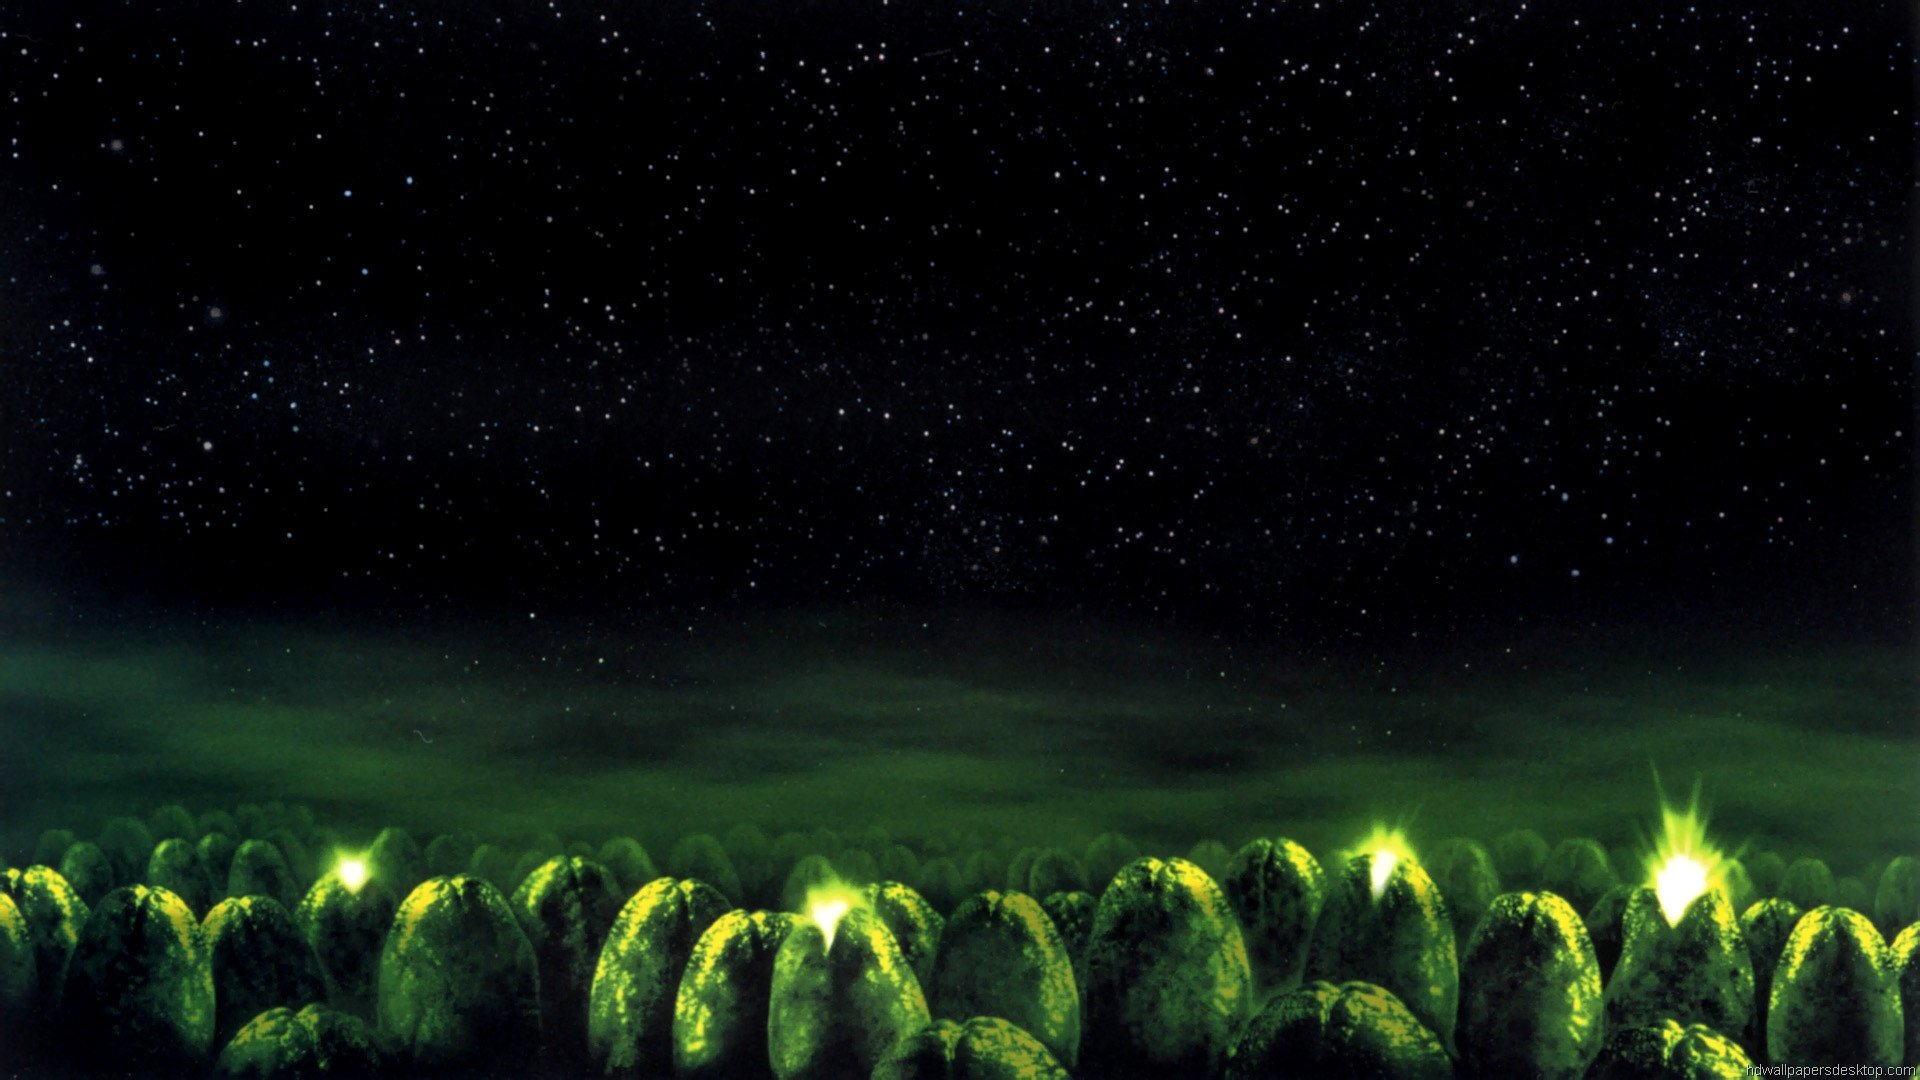 Best Aliens Film Wallpaper ID149034 For High Resolution Hd 1080p Computer